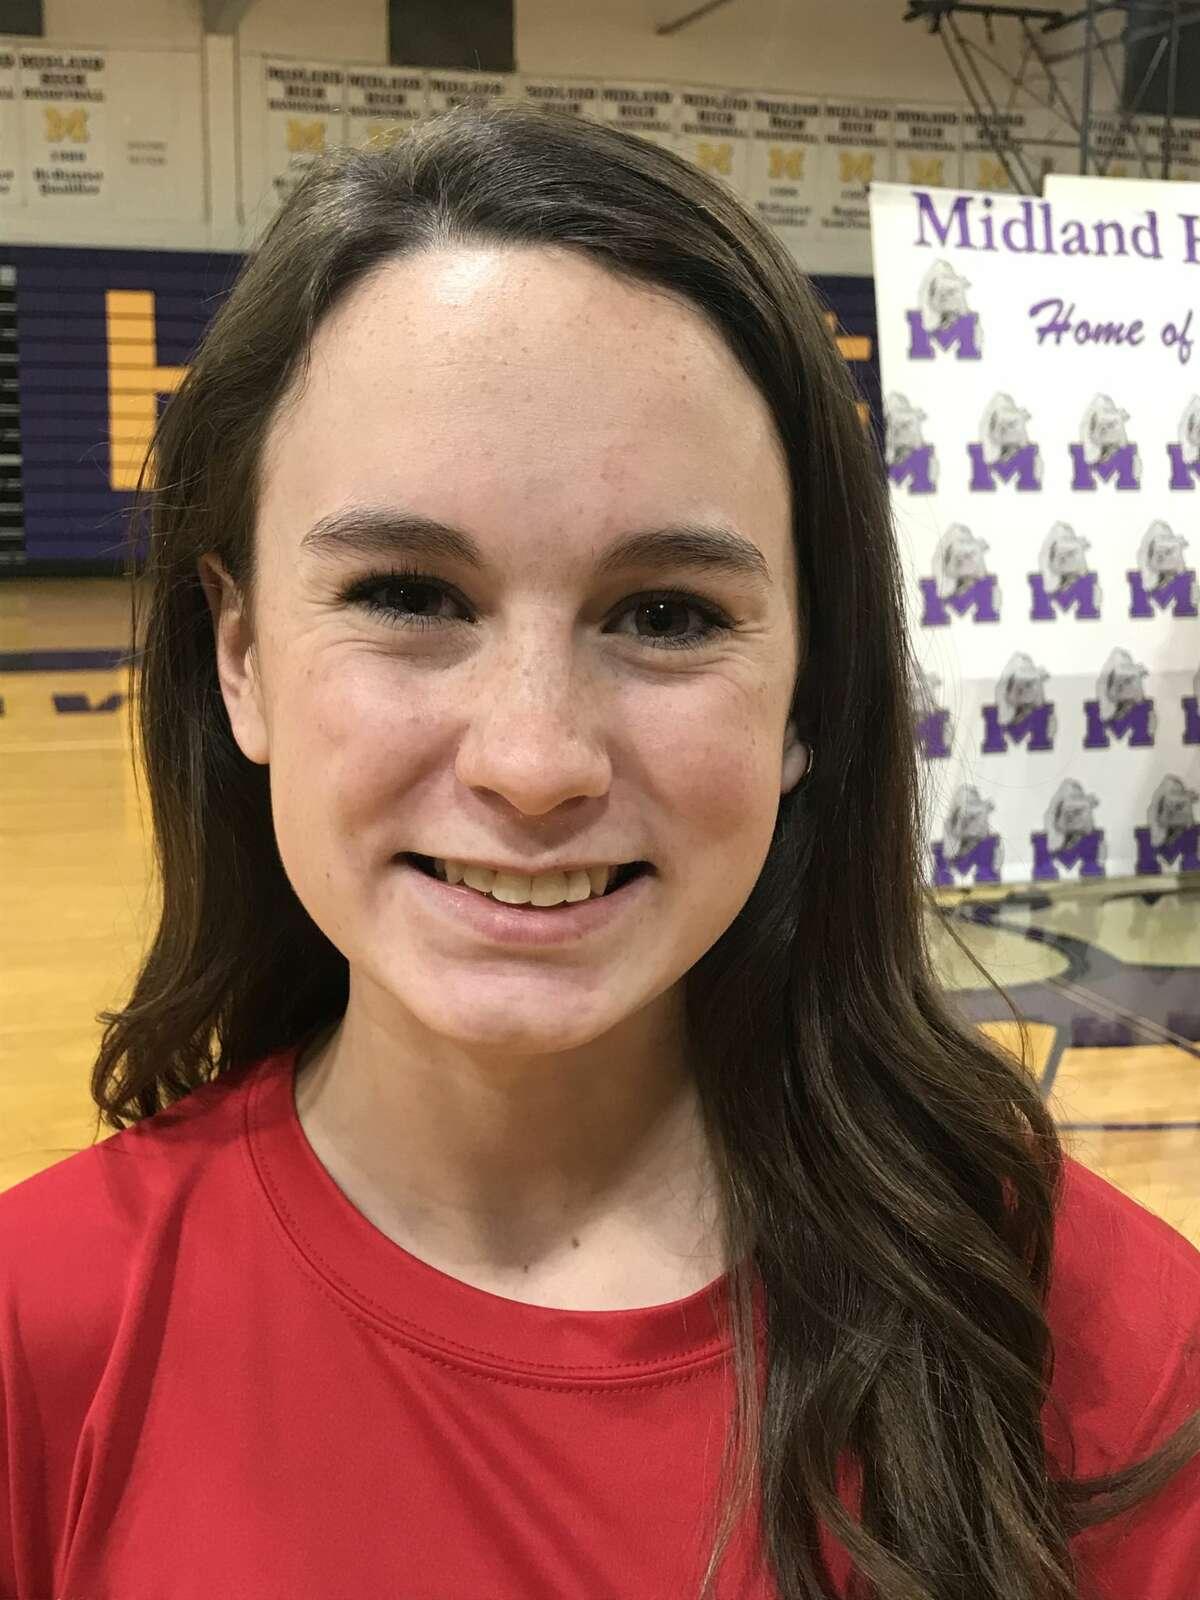 Midland High diver Kristen Hepfer